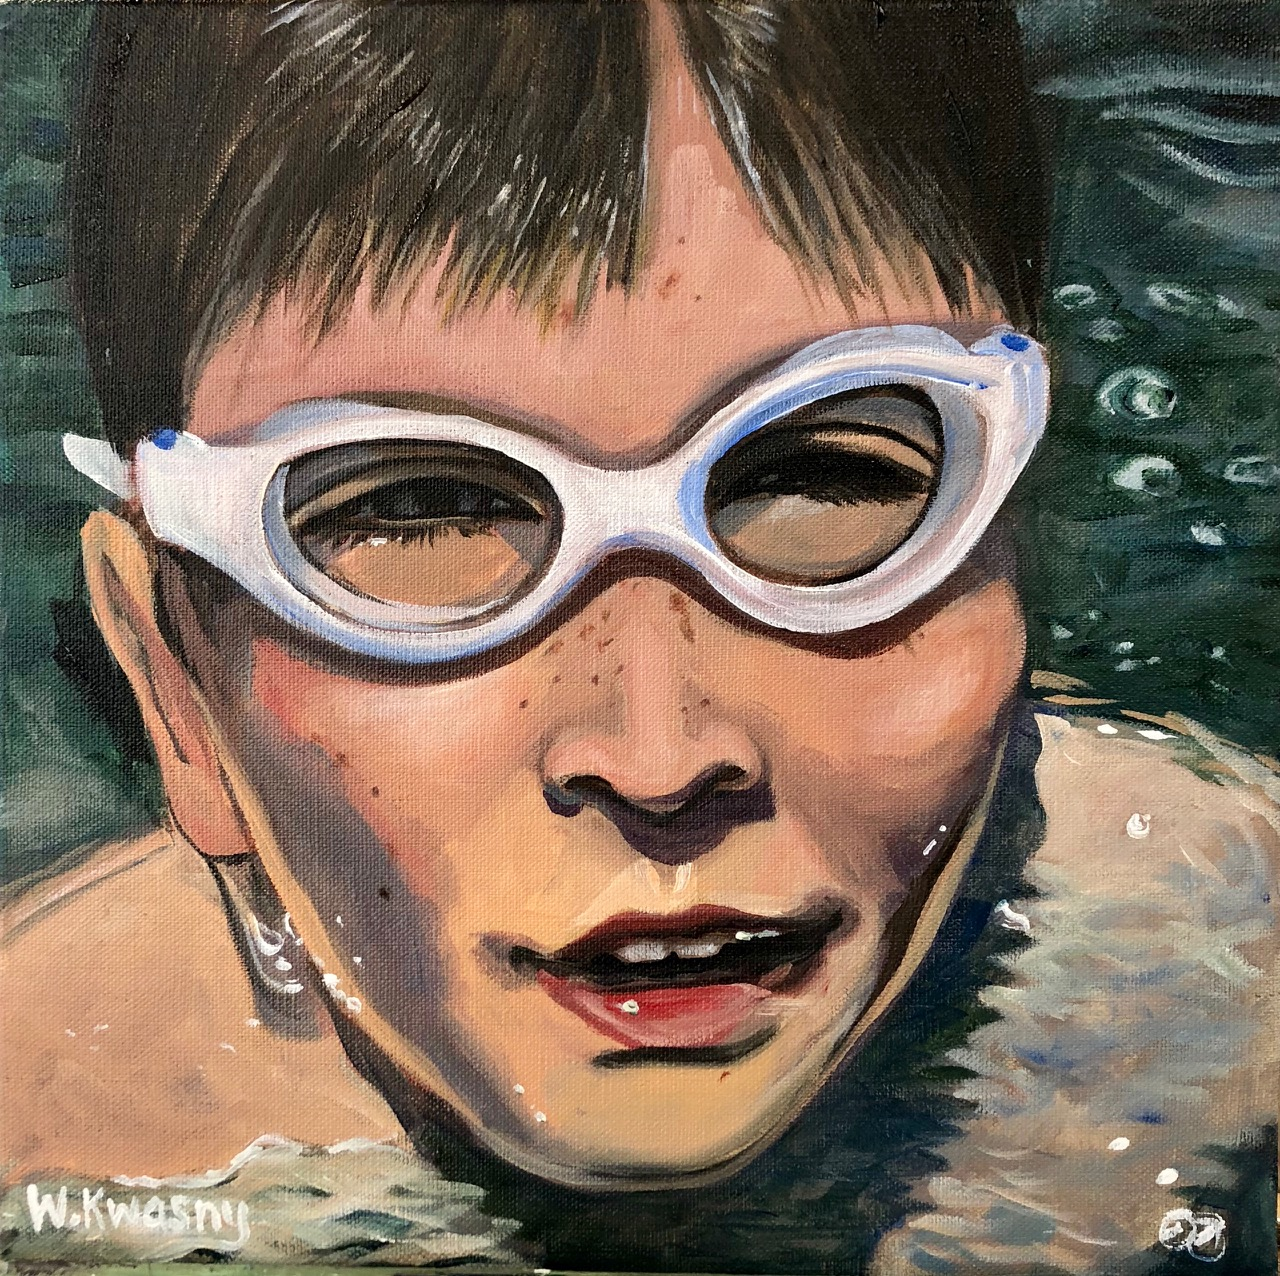 Lake Swimming Centers Him